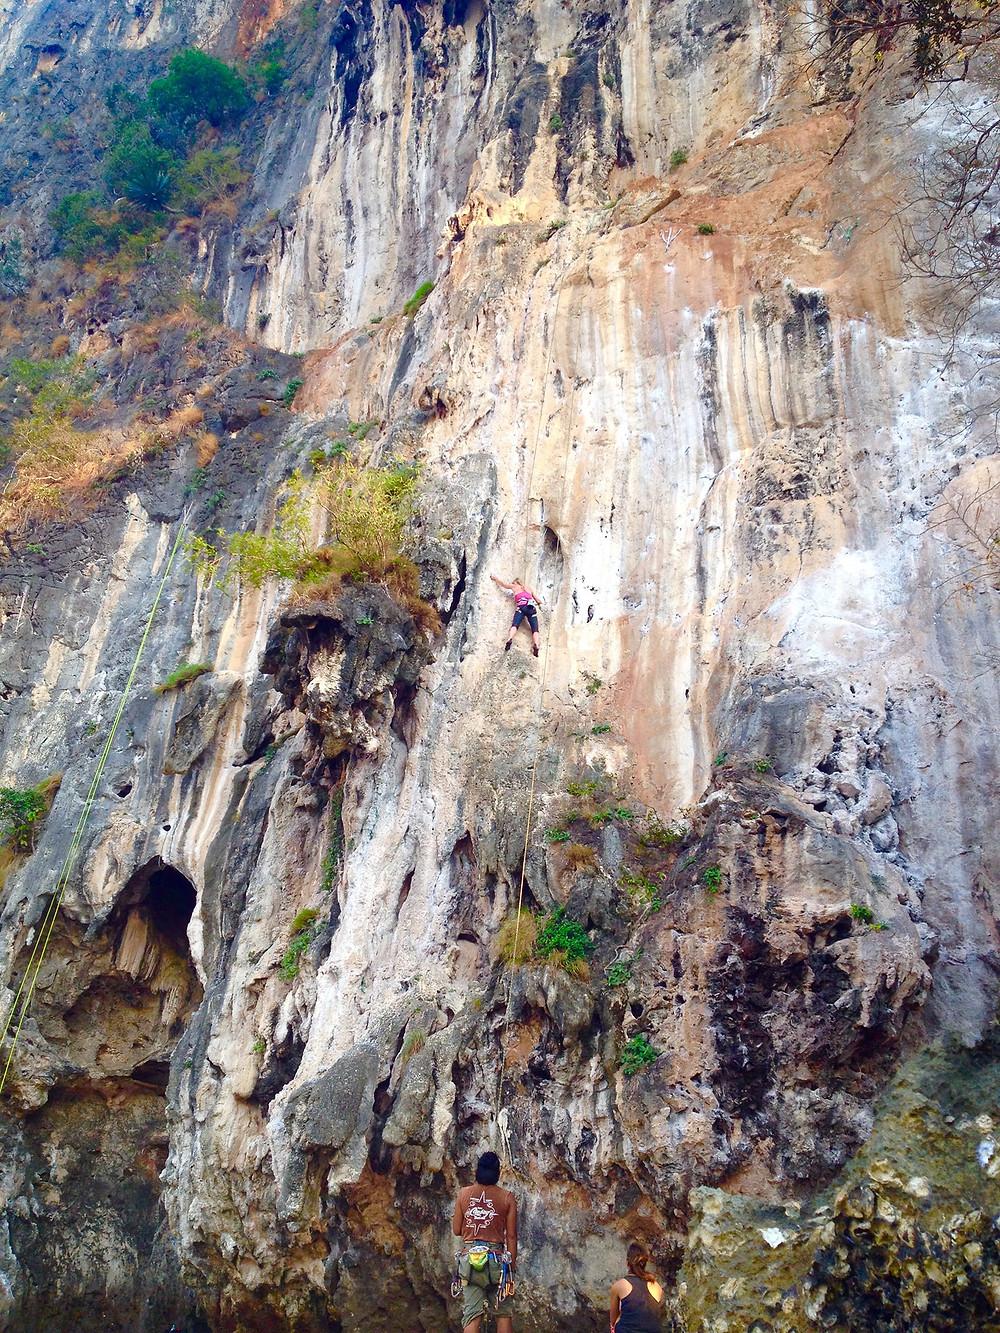 Nikki Busuttil Rockclimbing 1-2-3 Wall East Railay Thailand